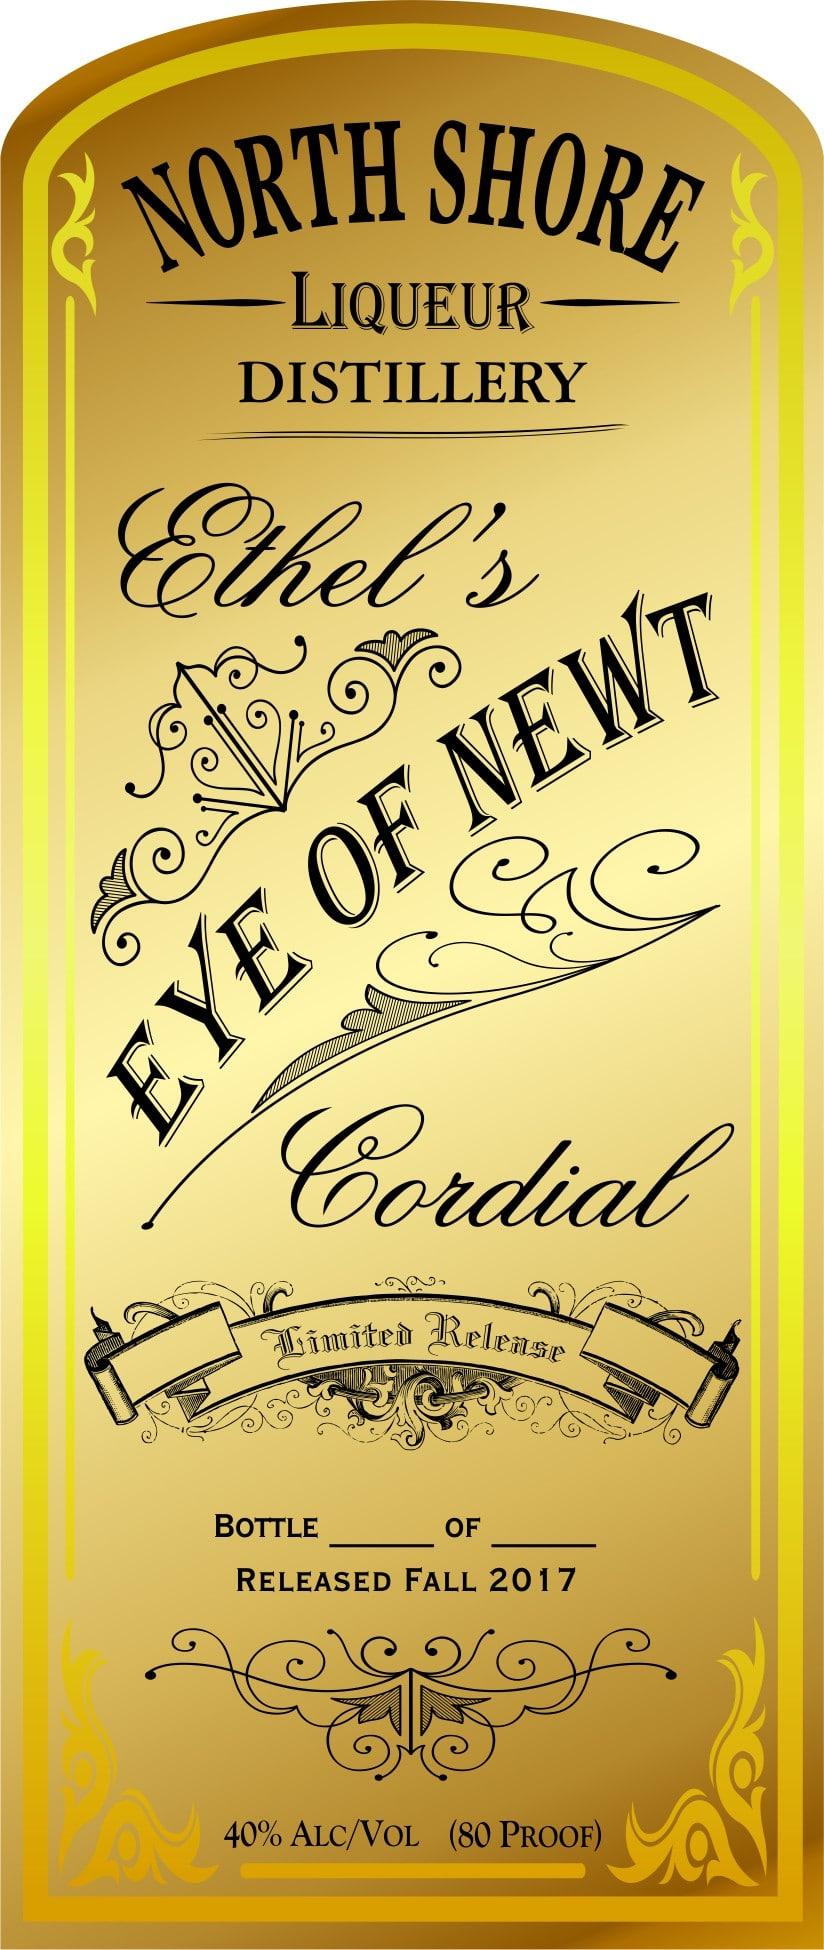 Ethel's Eye of Newt Cordial